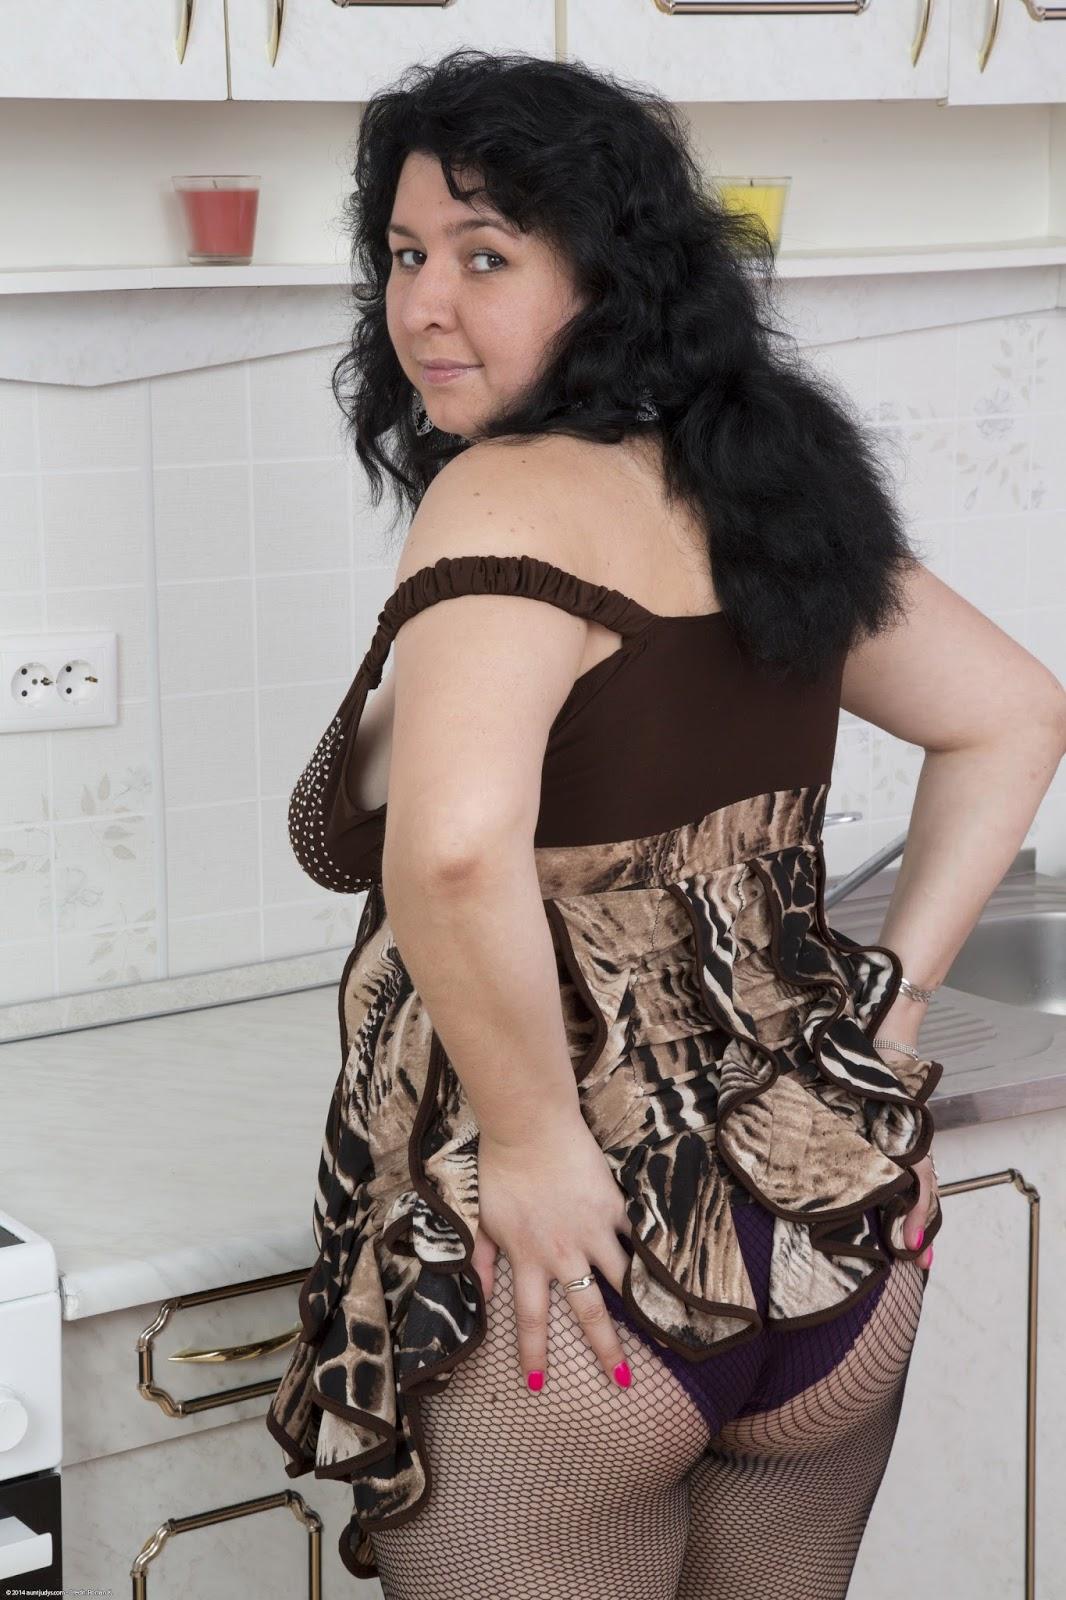 Solo 9 bbw granny with big natural boobs - 3 5